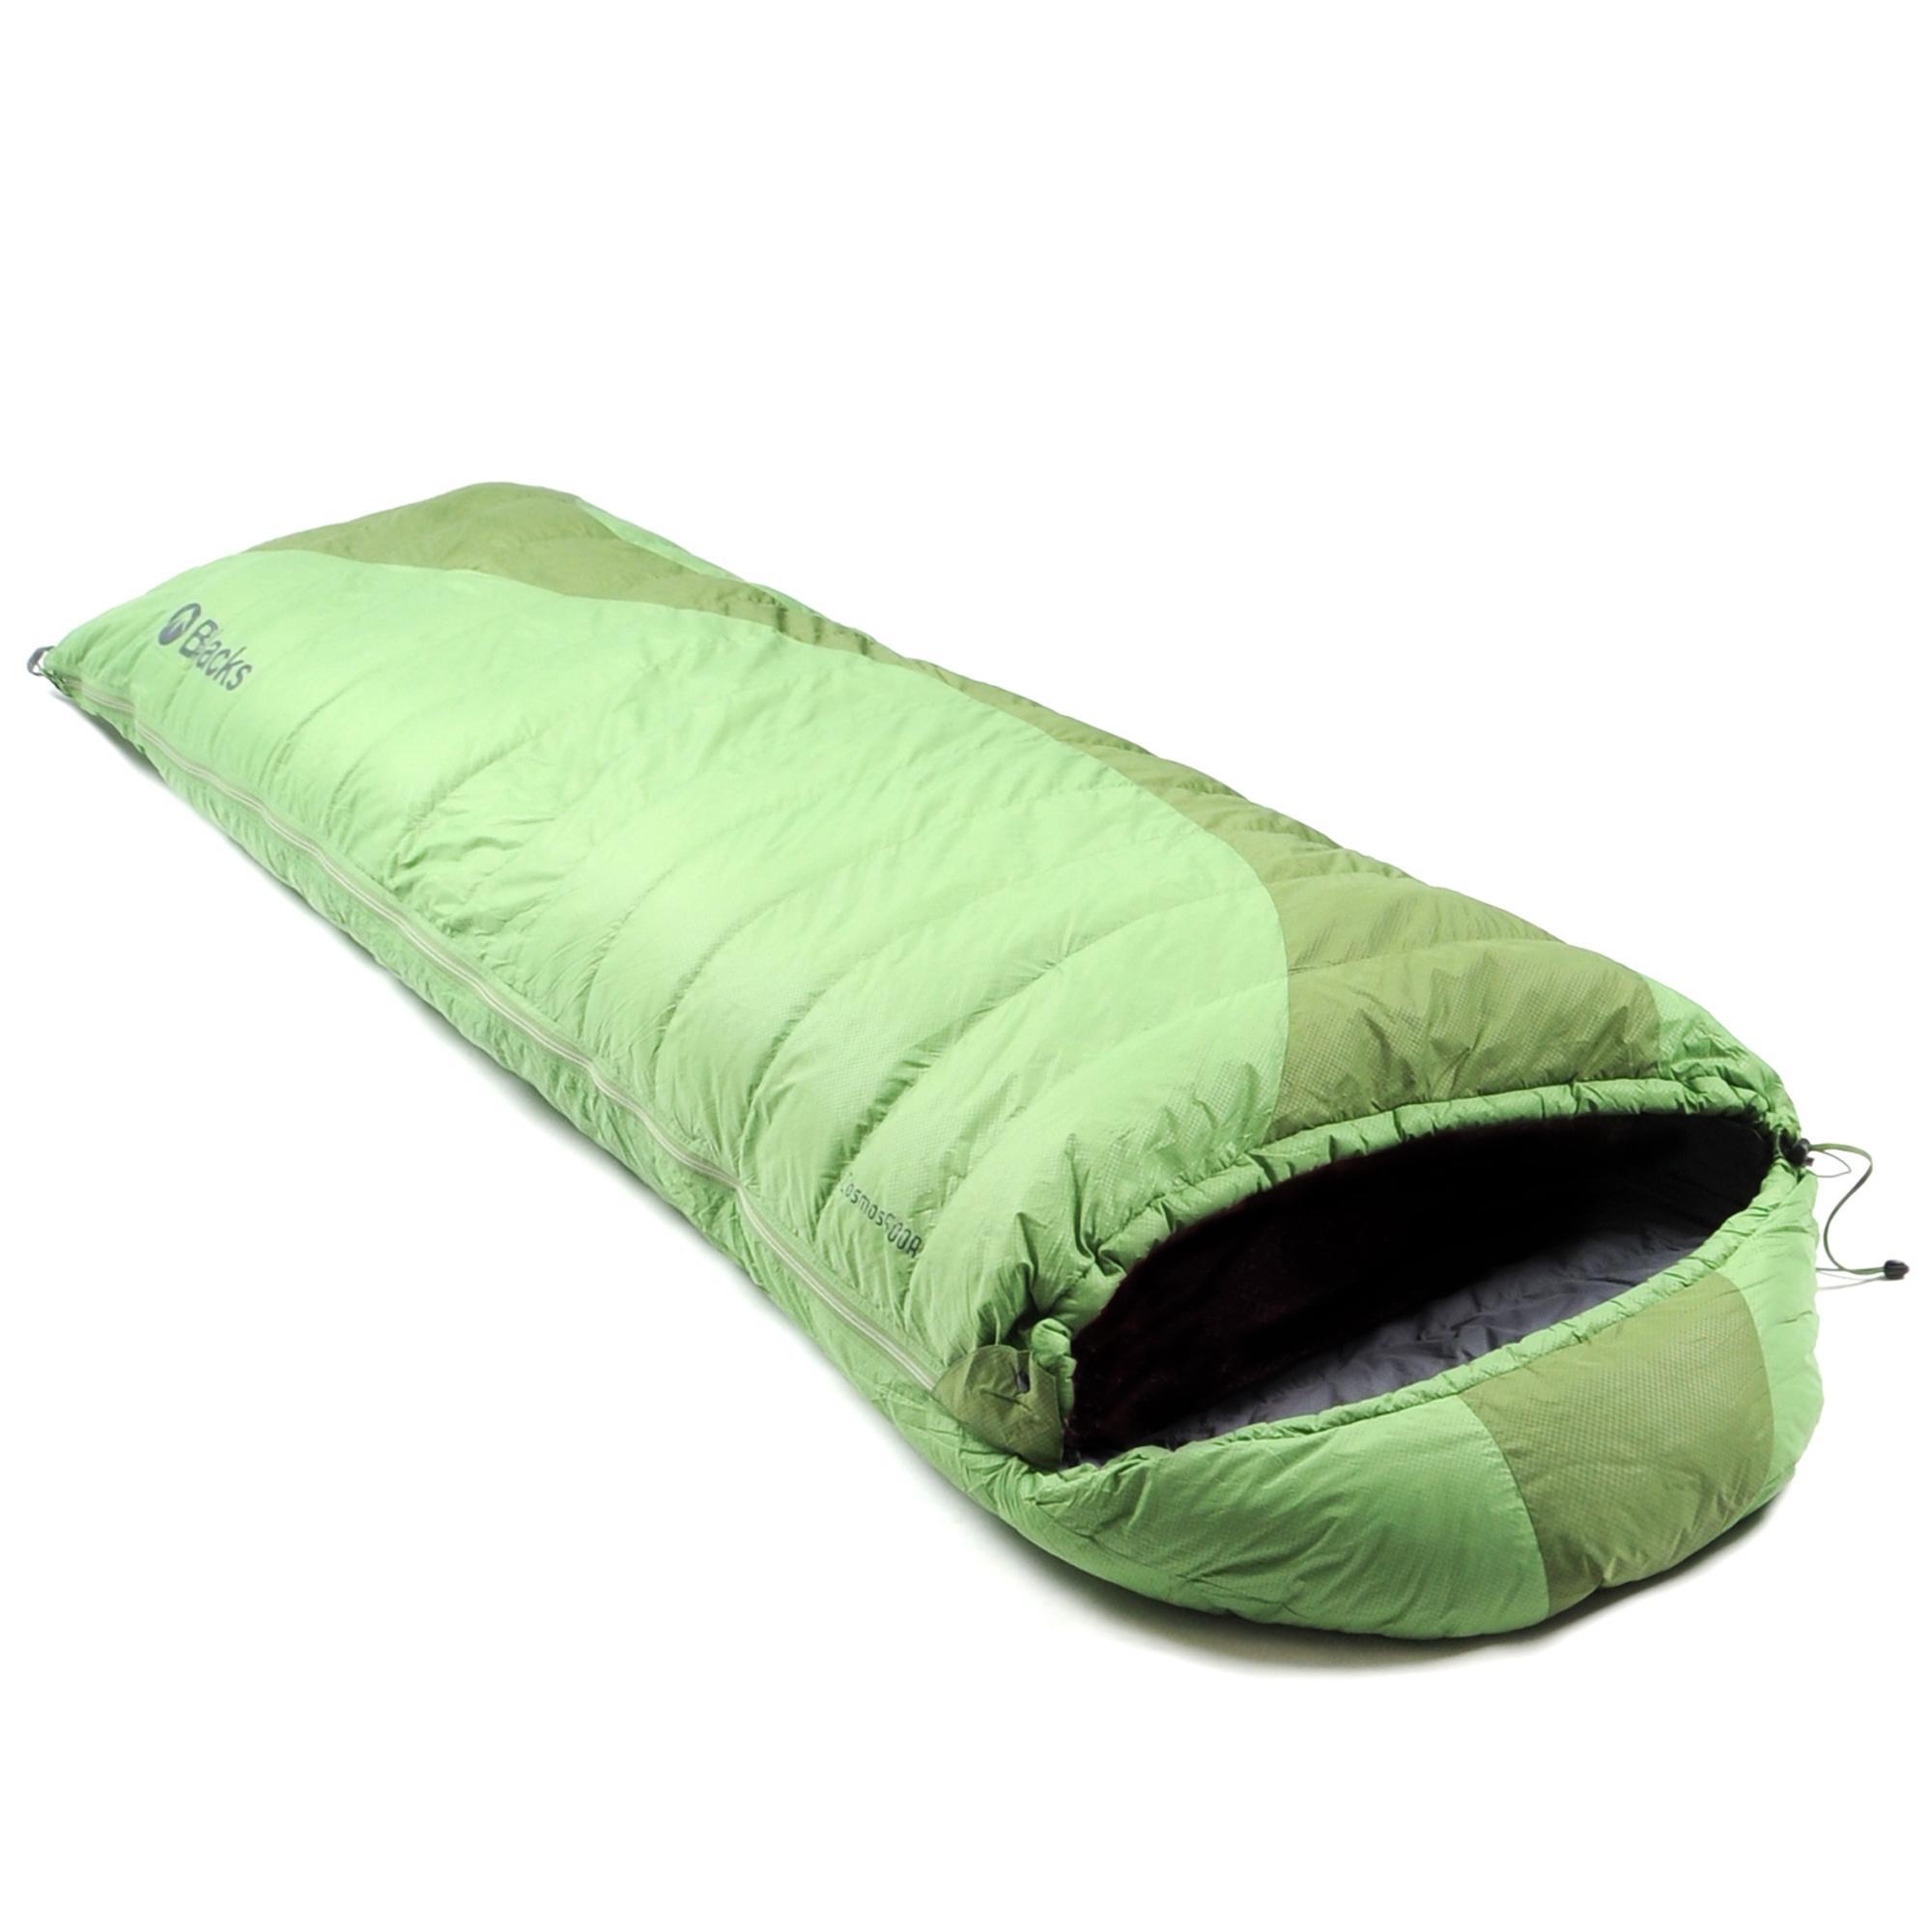 Blacks Cosmos 500 Sleeping Bag  Green Green